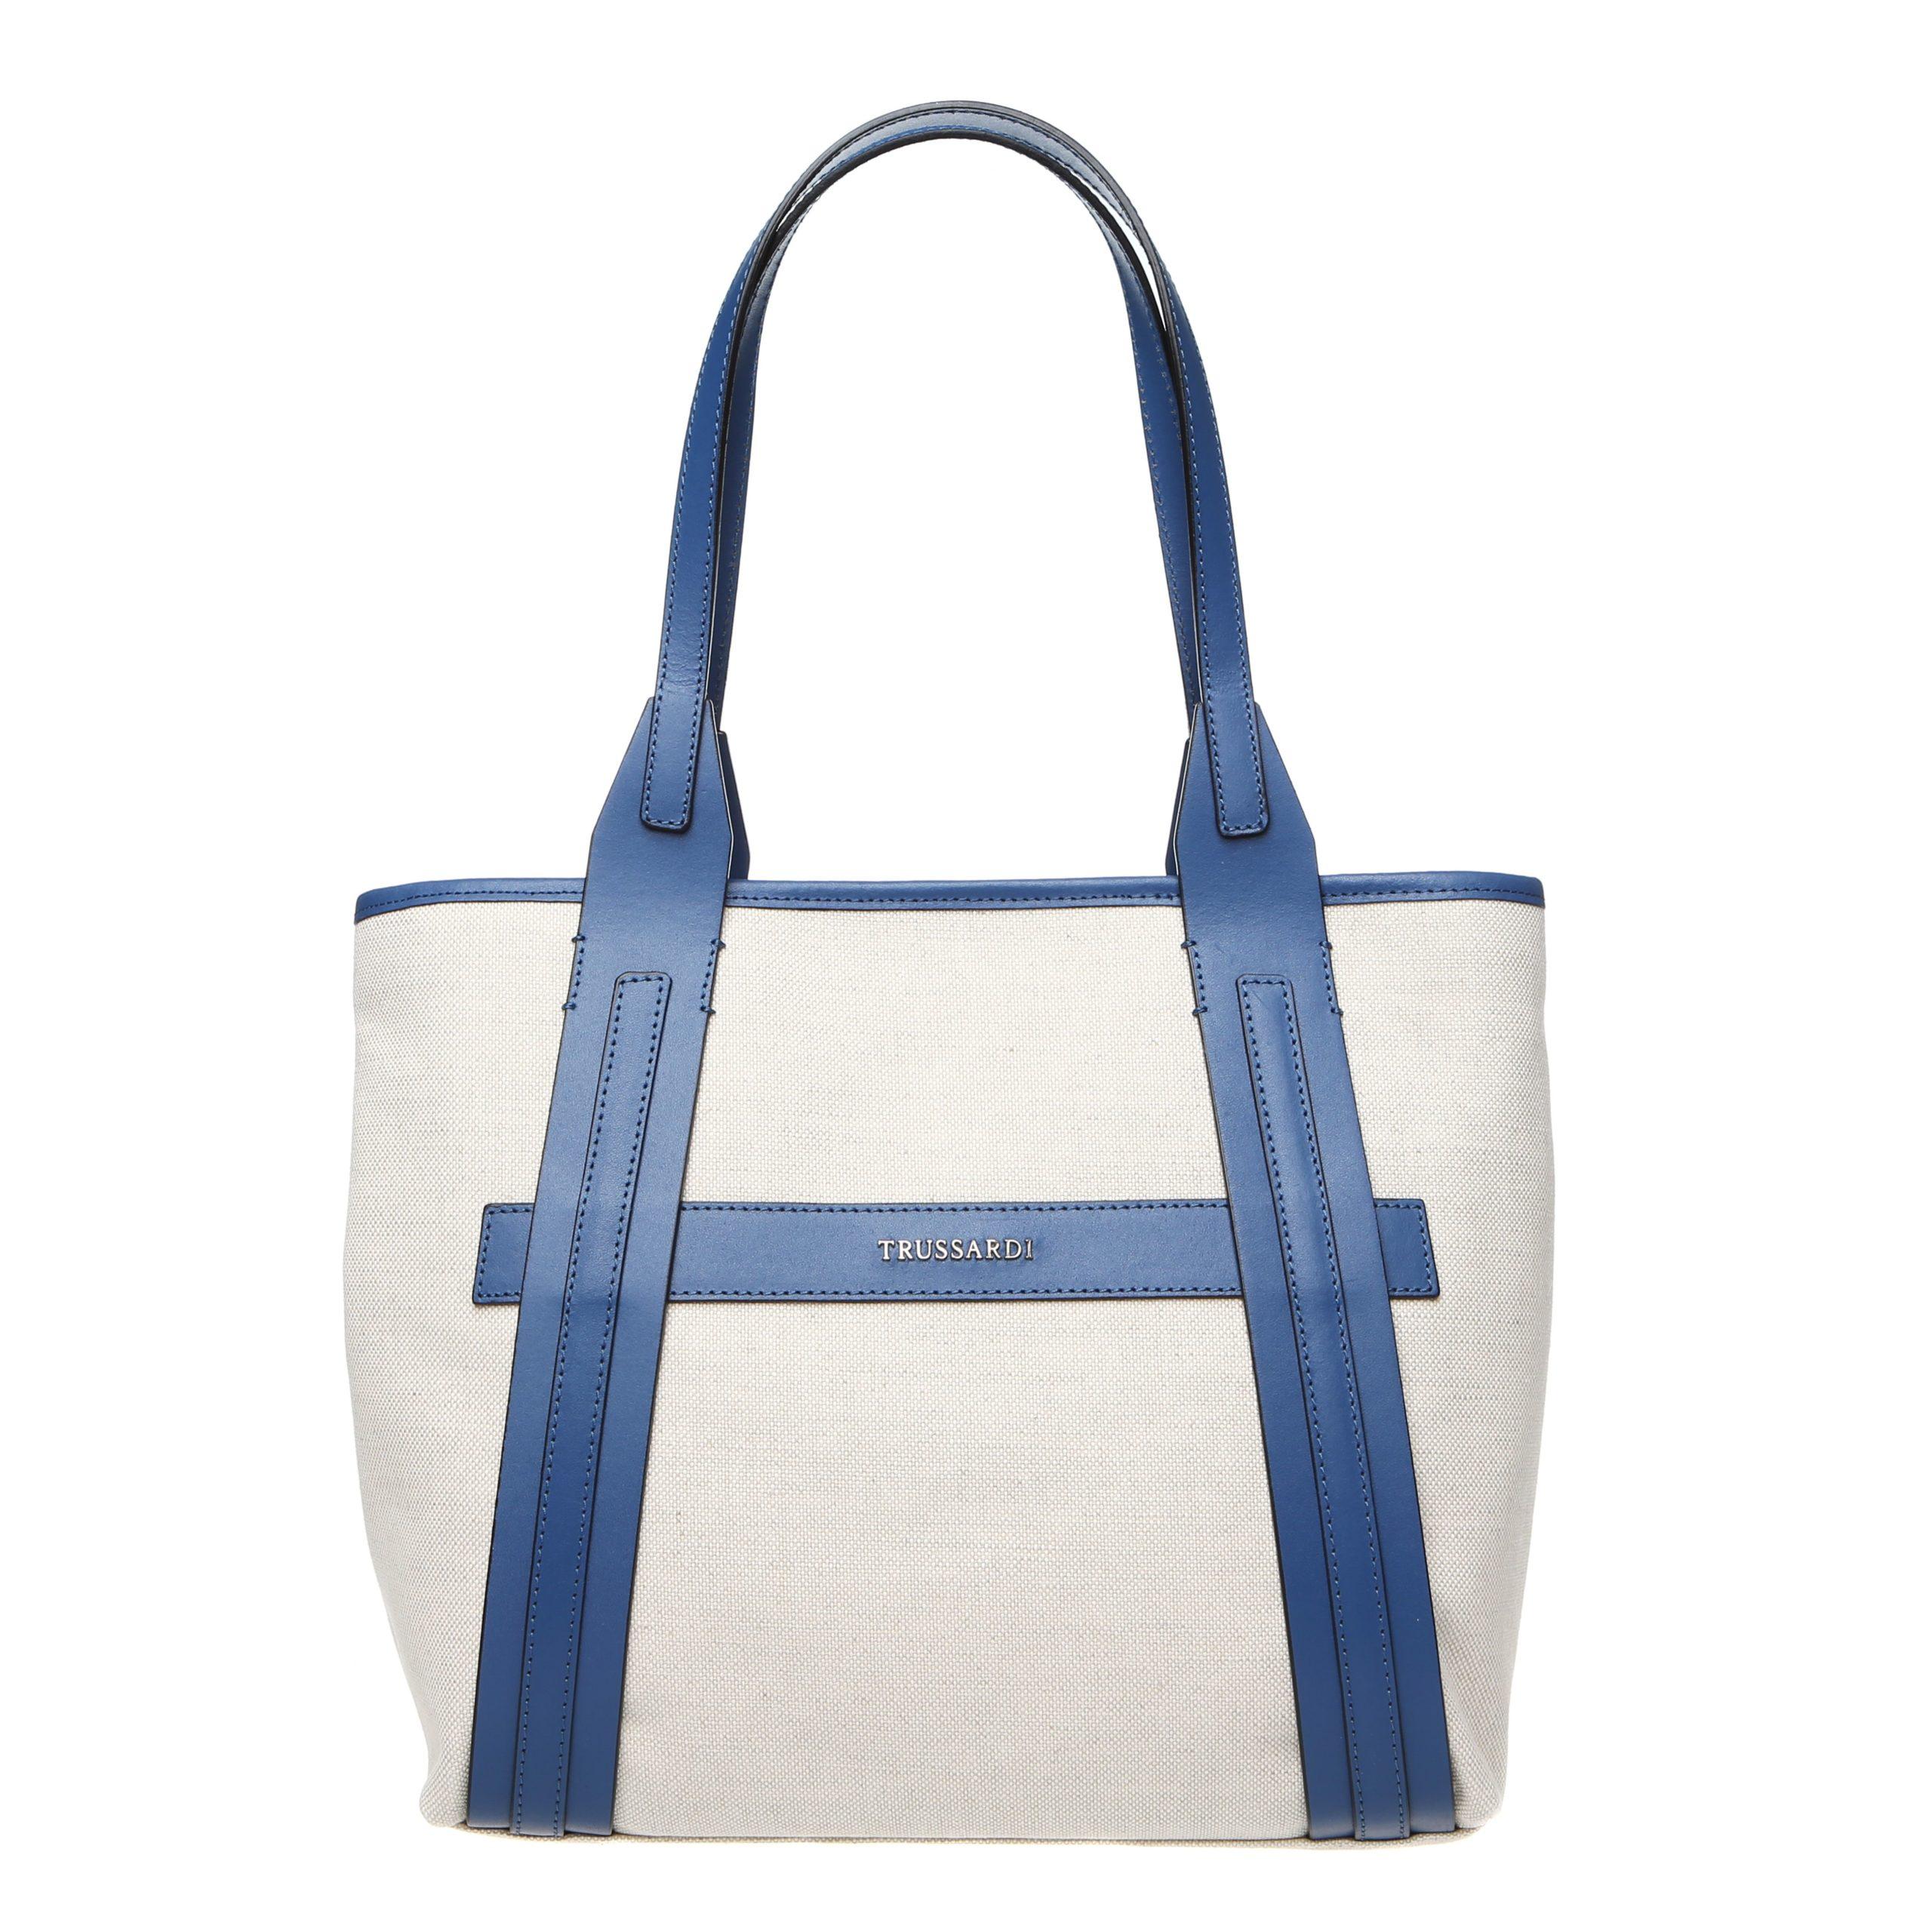 Trussardi Women's Shoulder Bag White 76B120M_128Natural-Blue